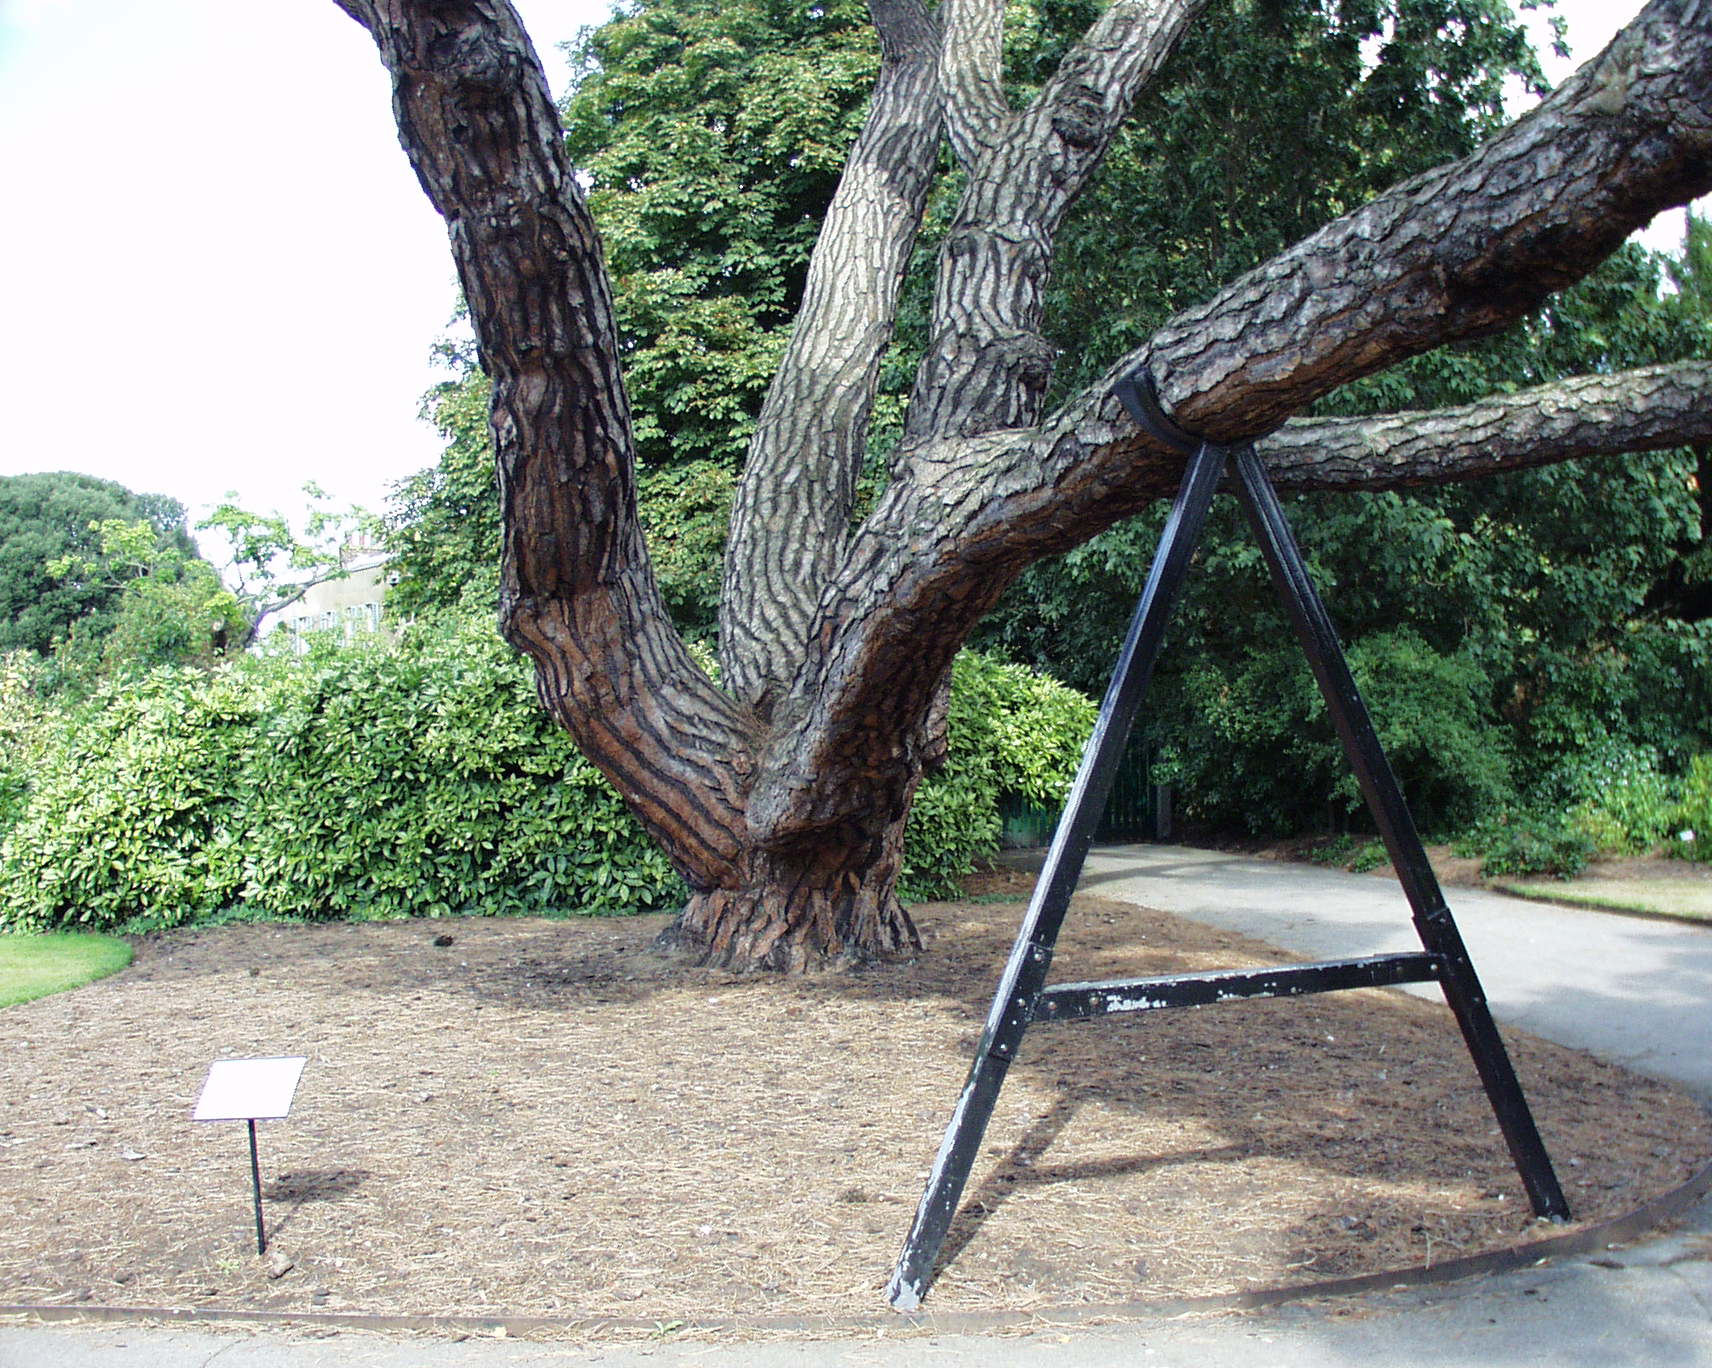 2000-09-03 Kew Gardens